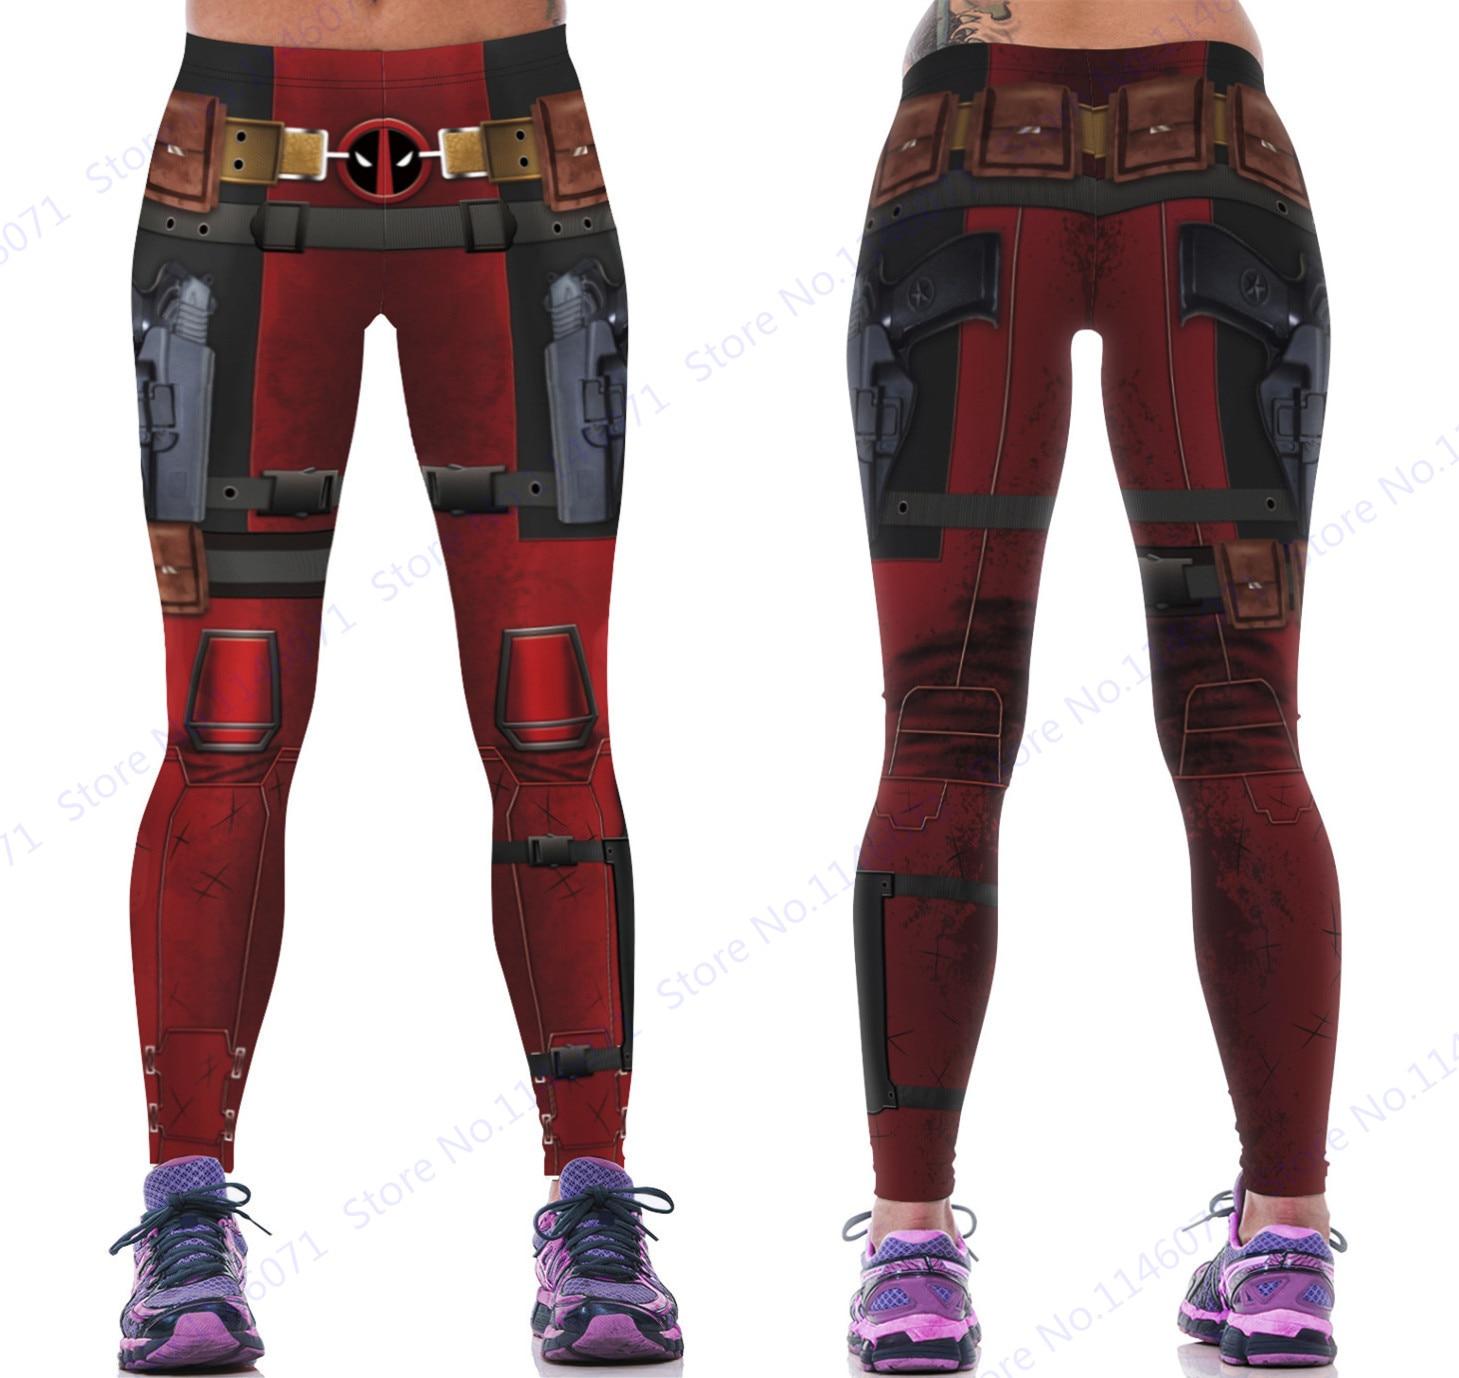 965c4d89a8a33 Deadpool Gym Yoga Pants Leggings Red Sexy Butt Lift Power Flex Pants  Stretchy Slimming Fitness Running Tights High Waist Women's